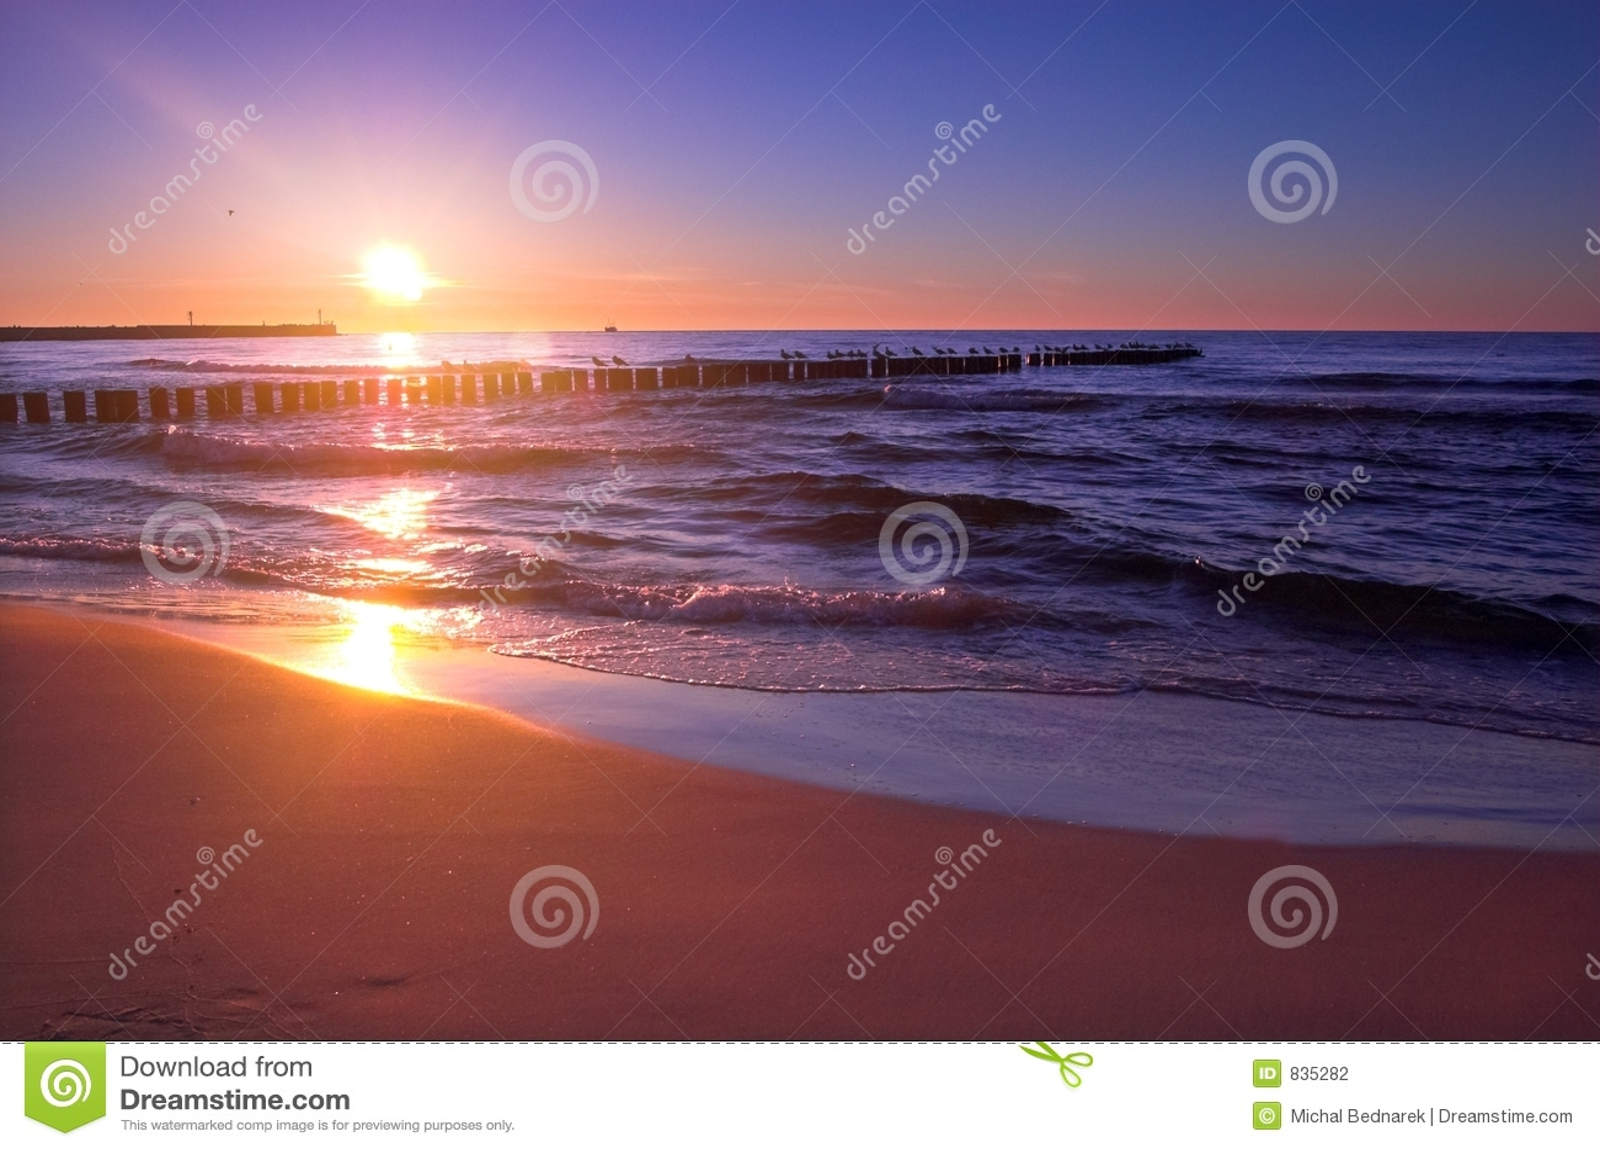 Sunset scenic